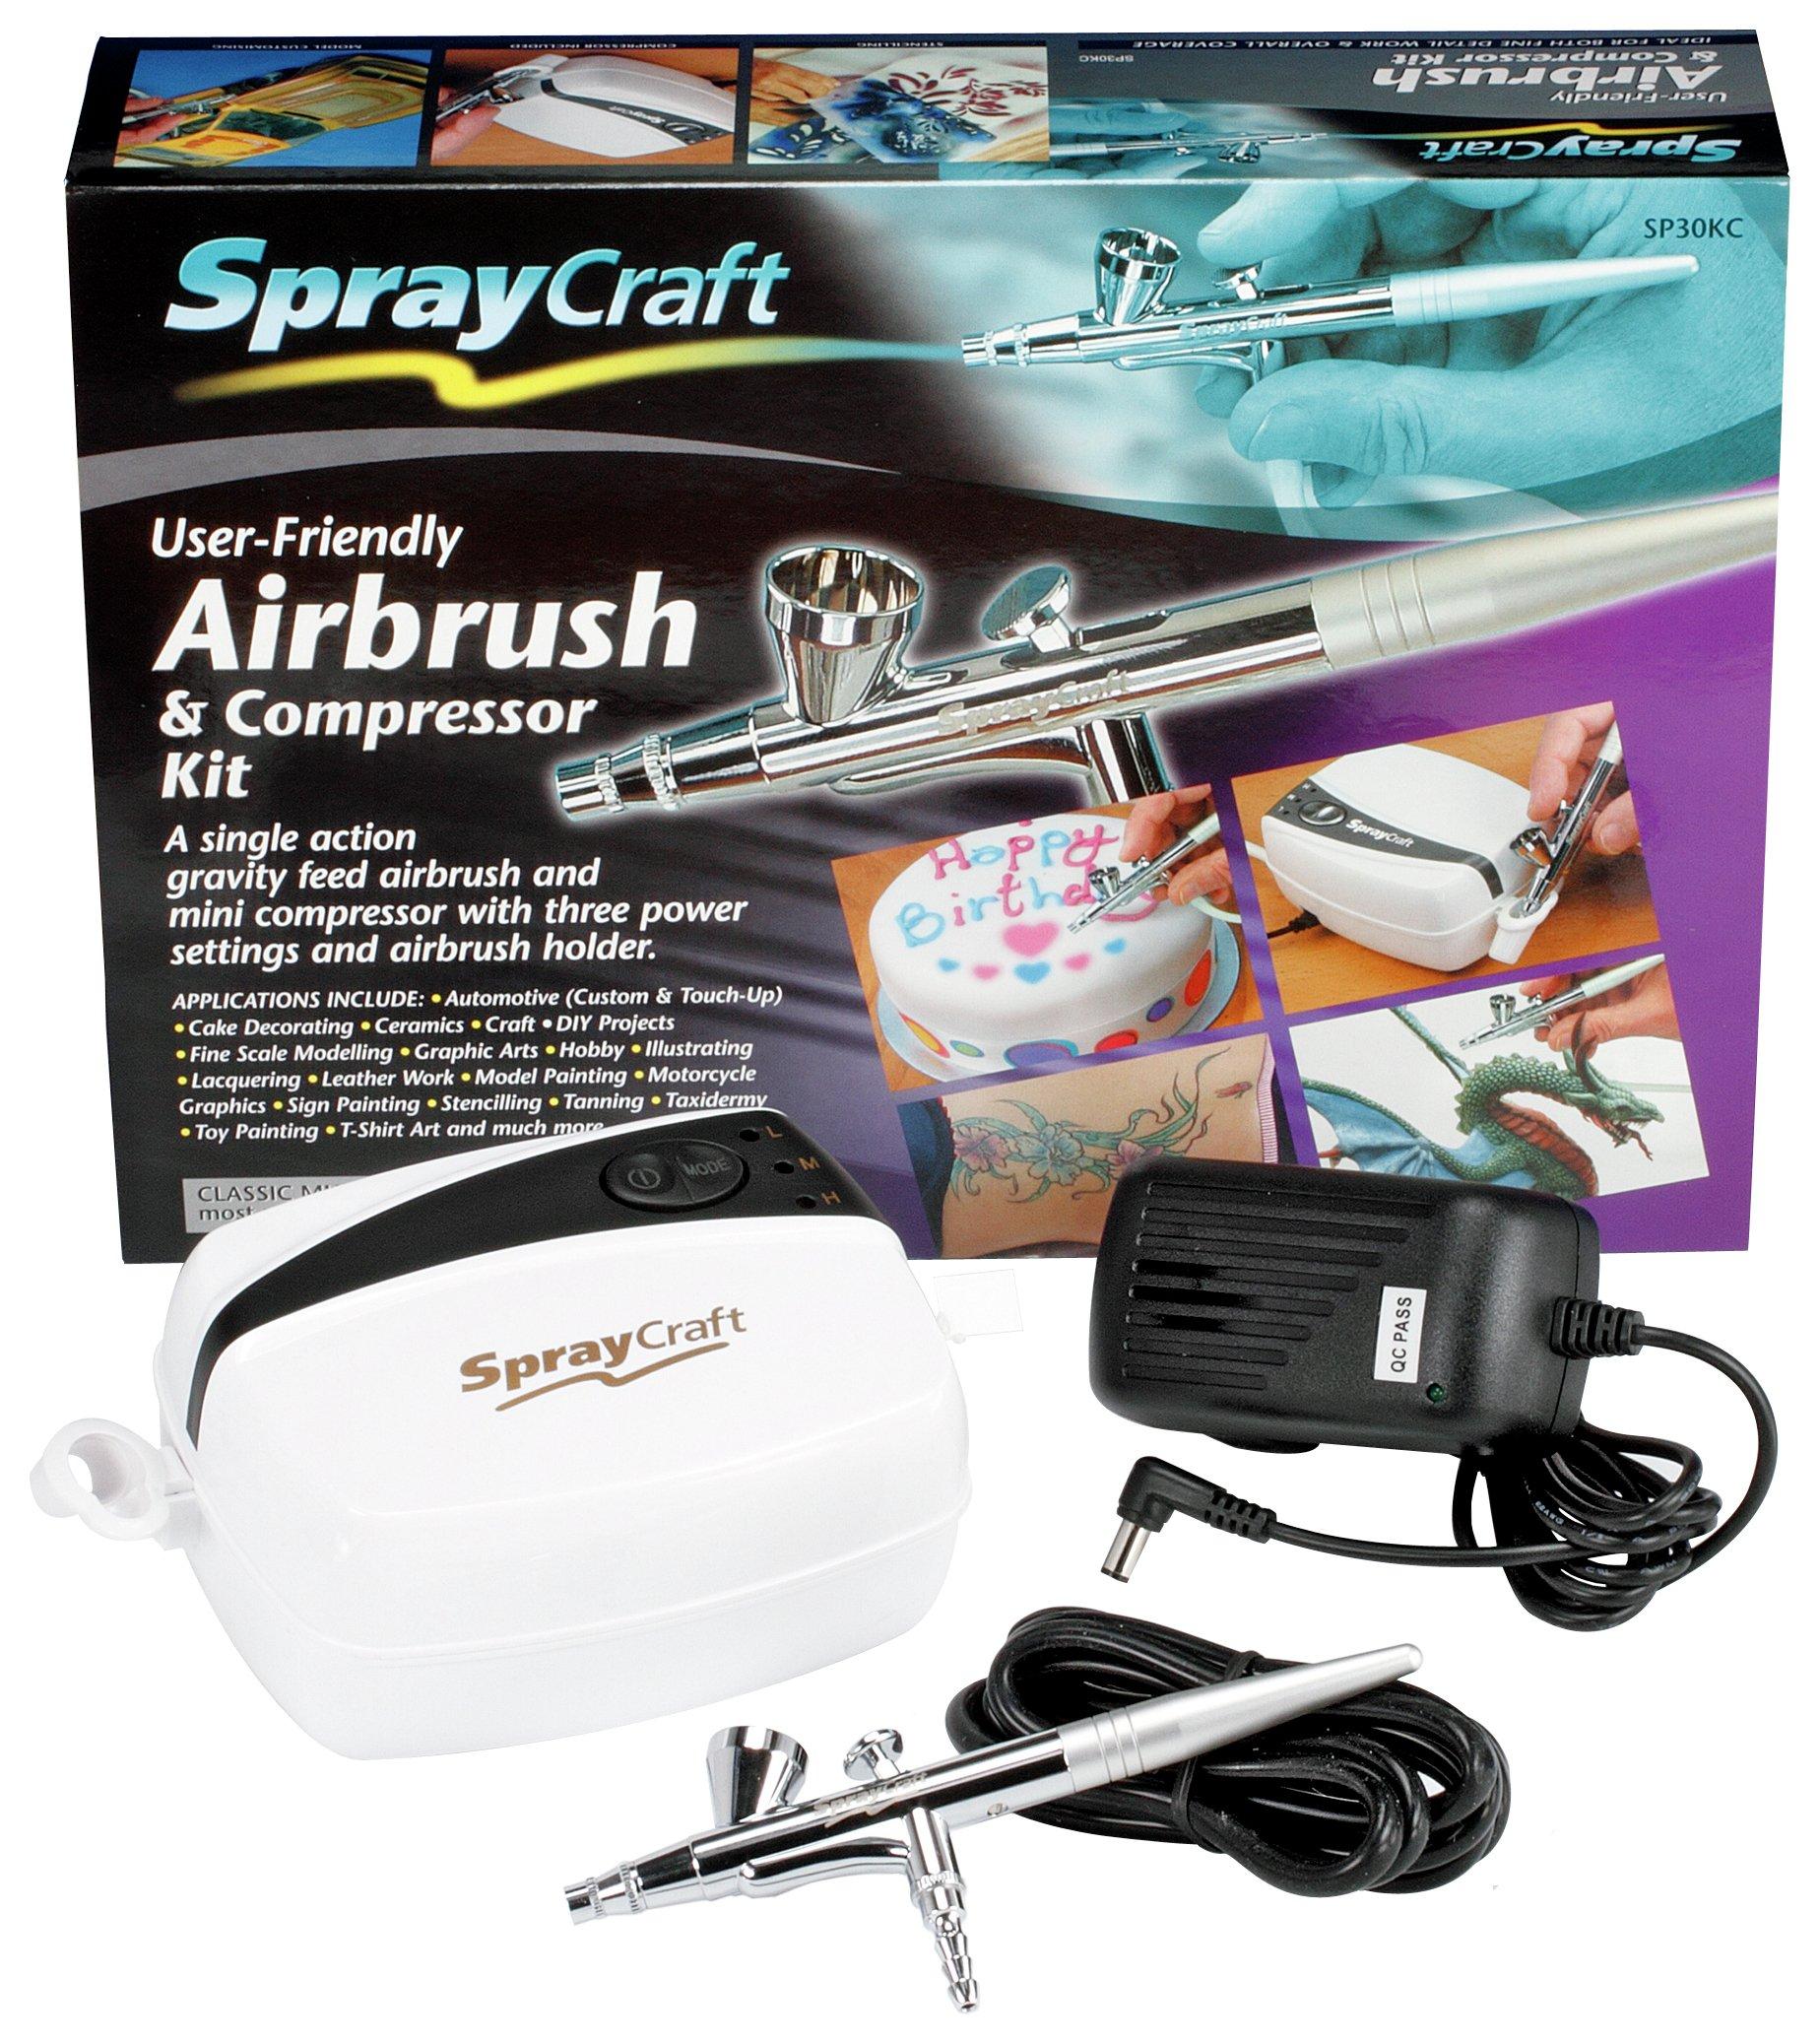 Spraycraft Gravity Feed Airbrush and Compressor Kit